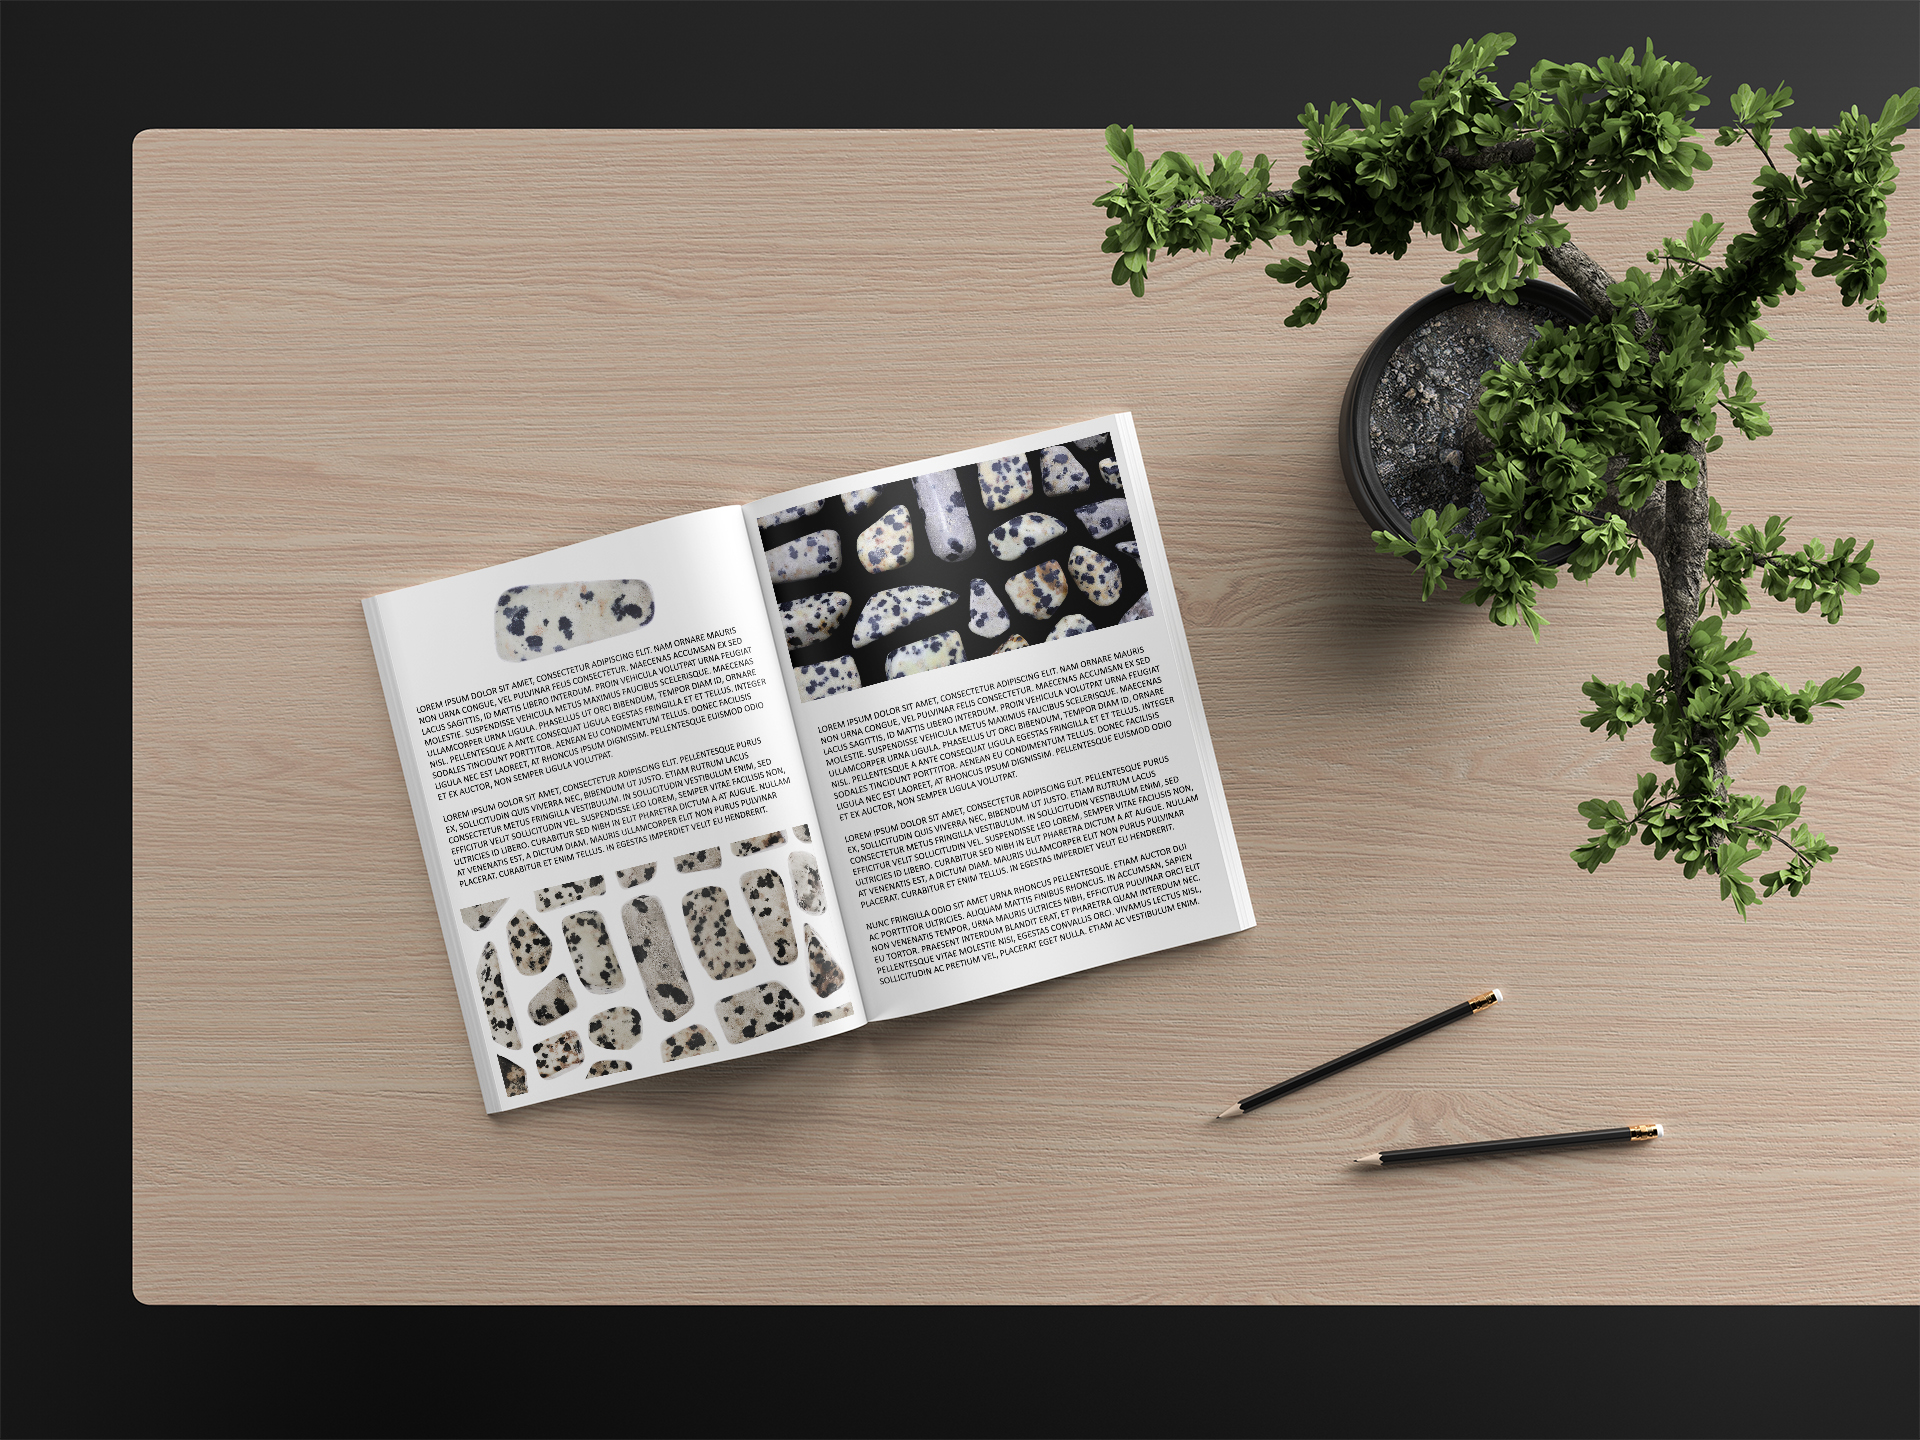 Dalmatian Jasper Background Textures Modern Magazine Article Illustrations Preview